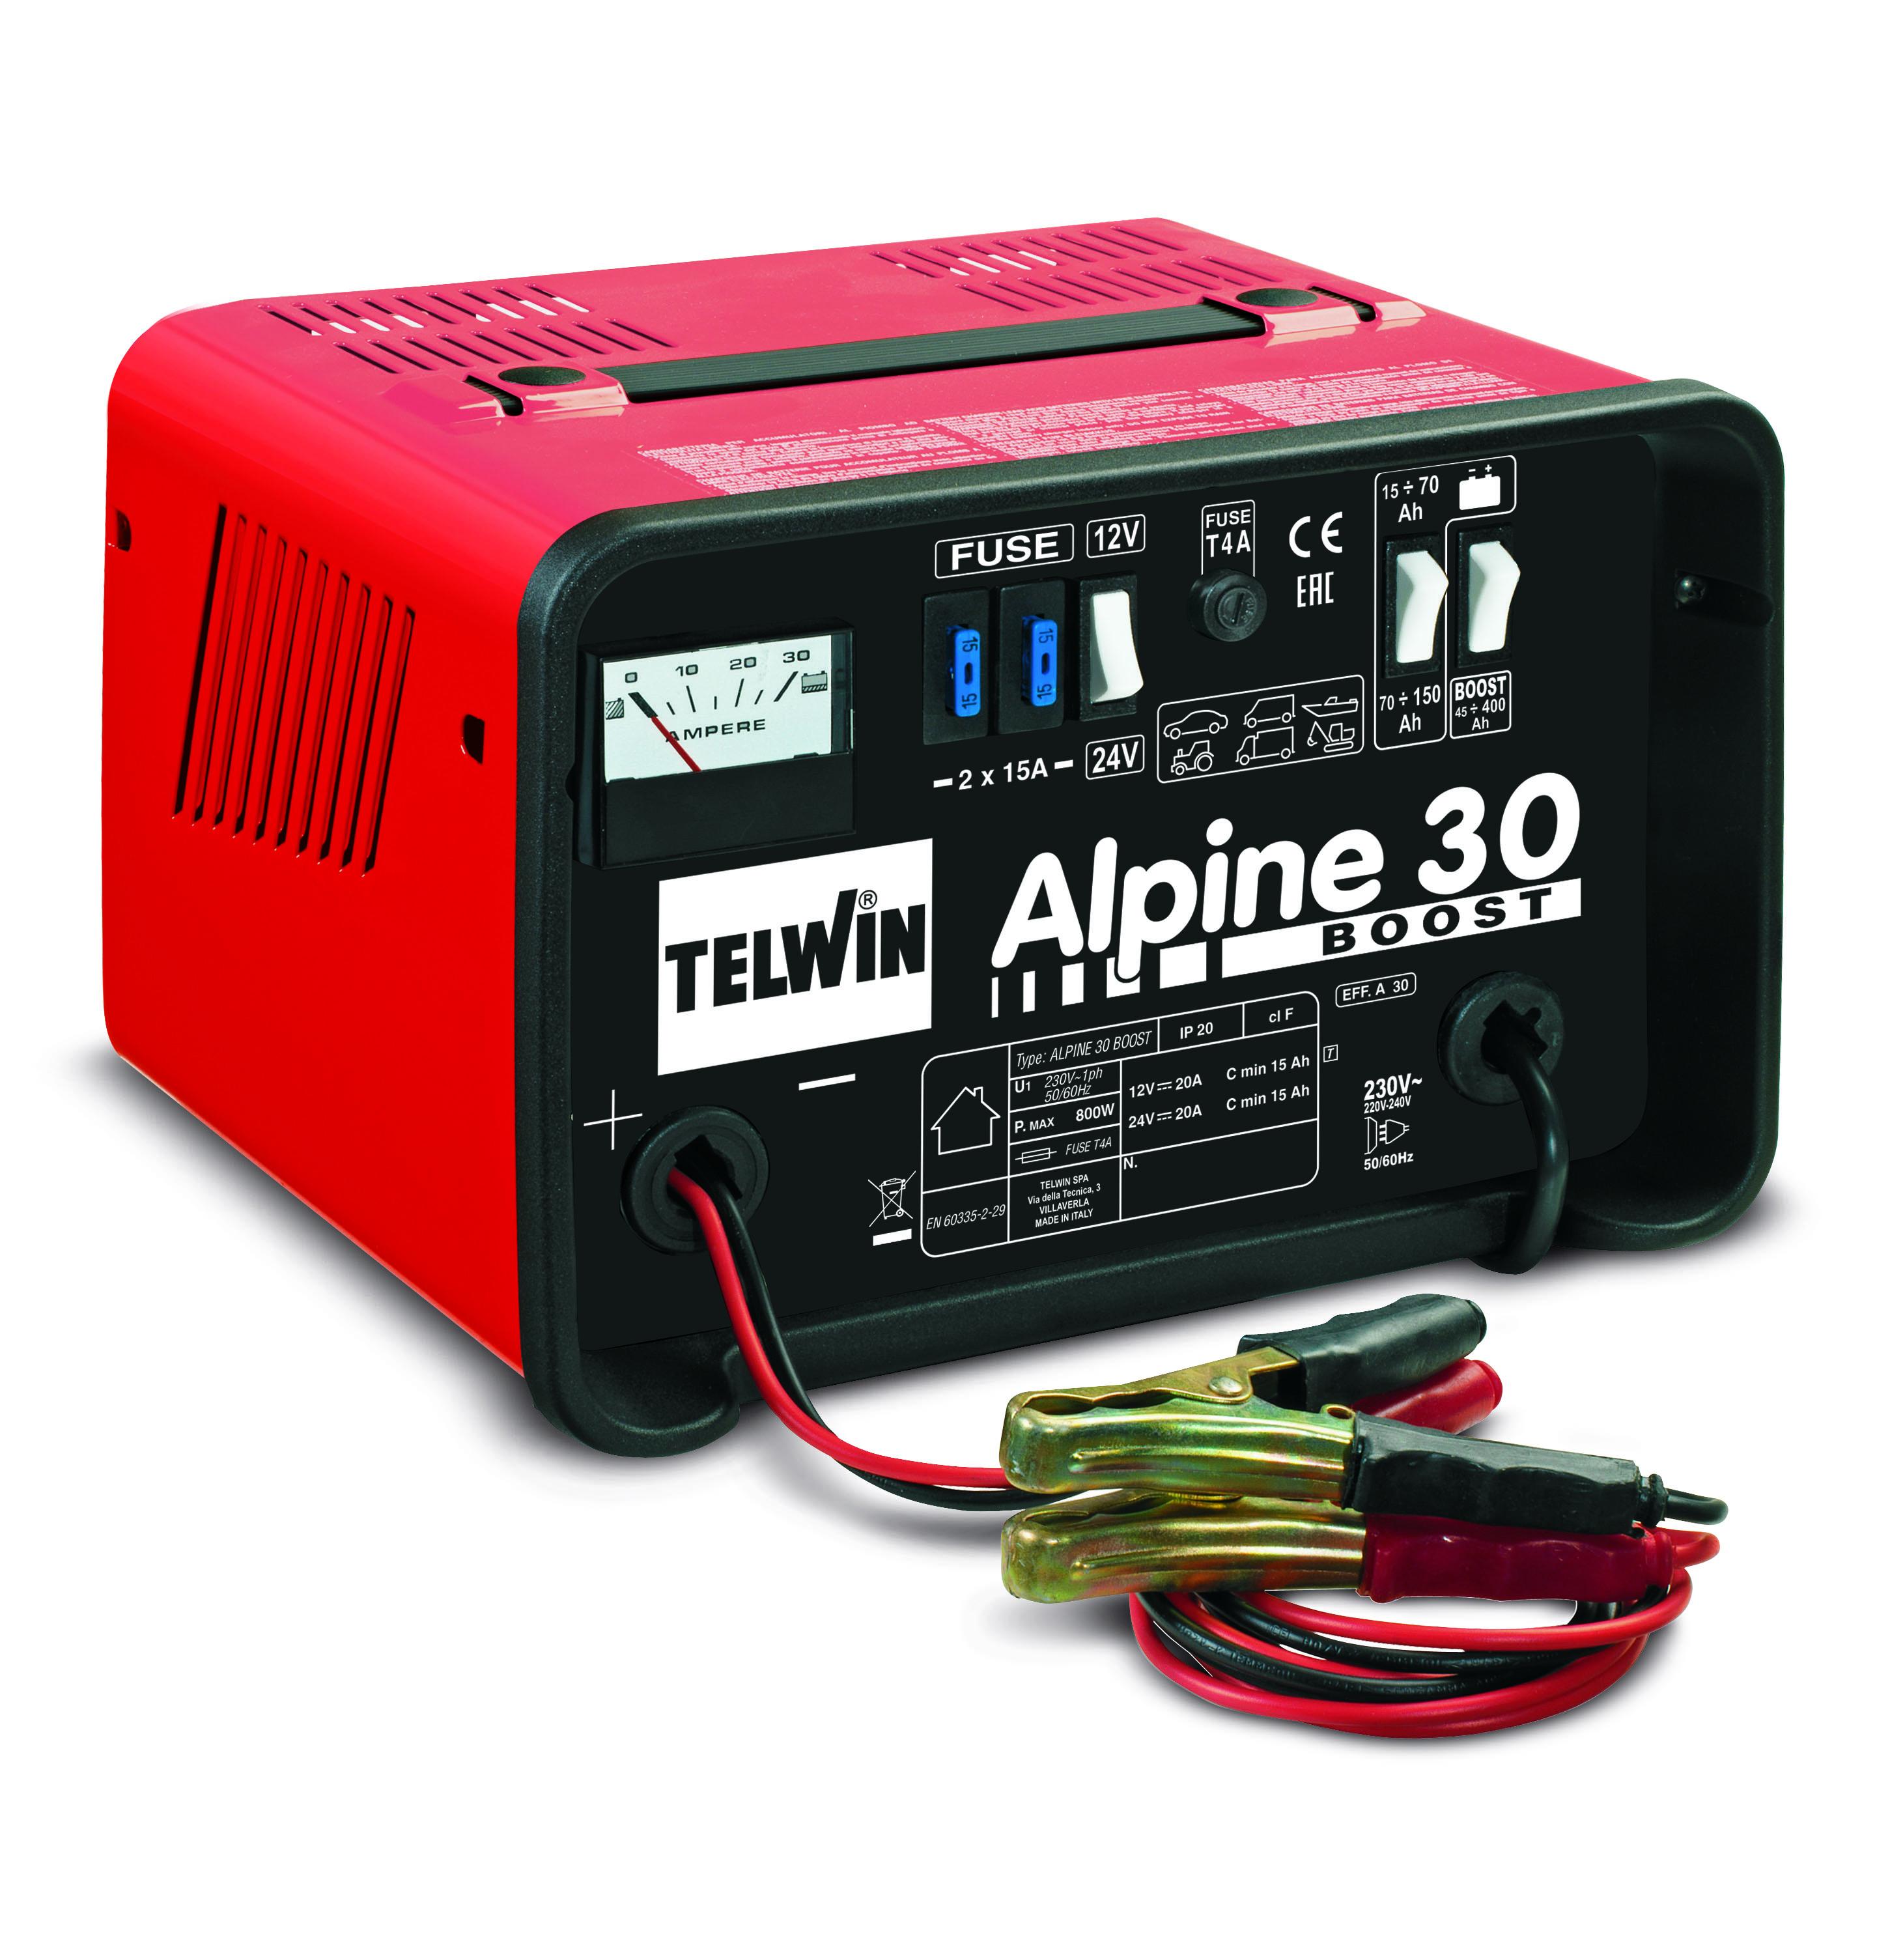 TELWIN 807547 - ALPINE 30 Boost Battery Charger, 230V 12-24V